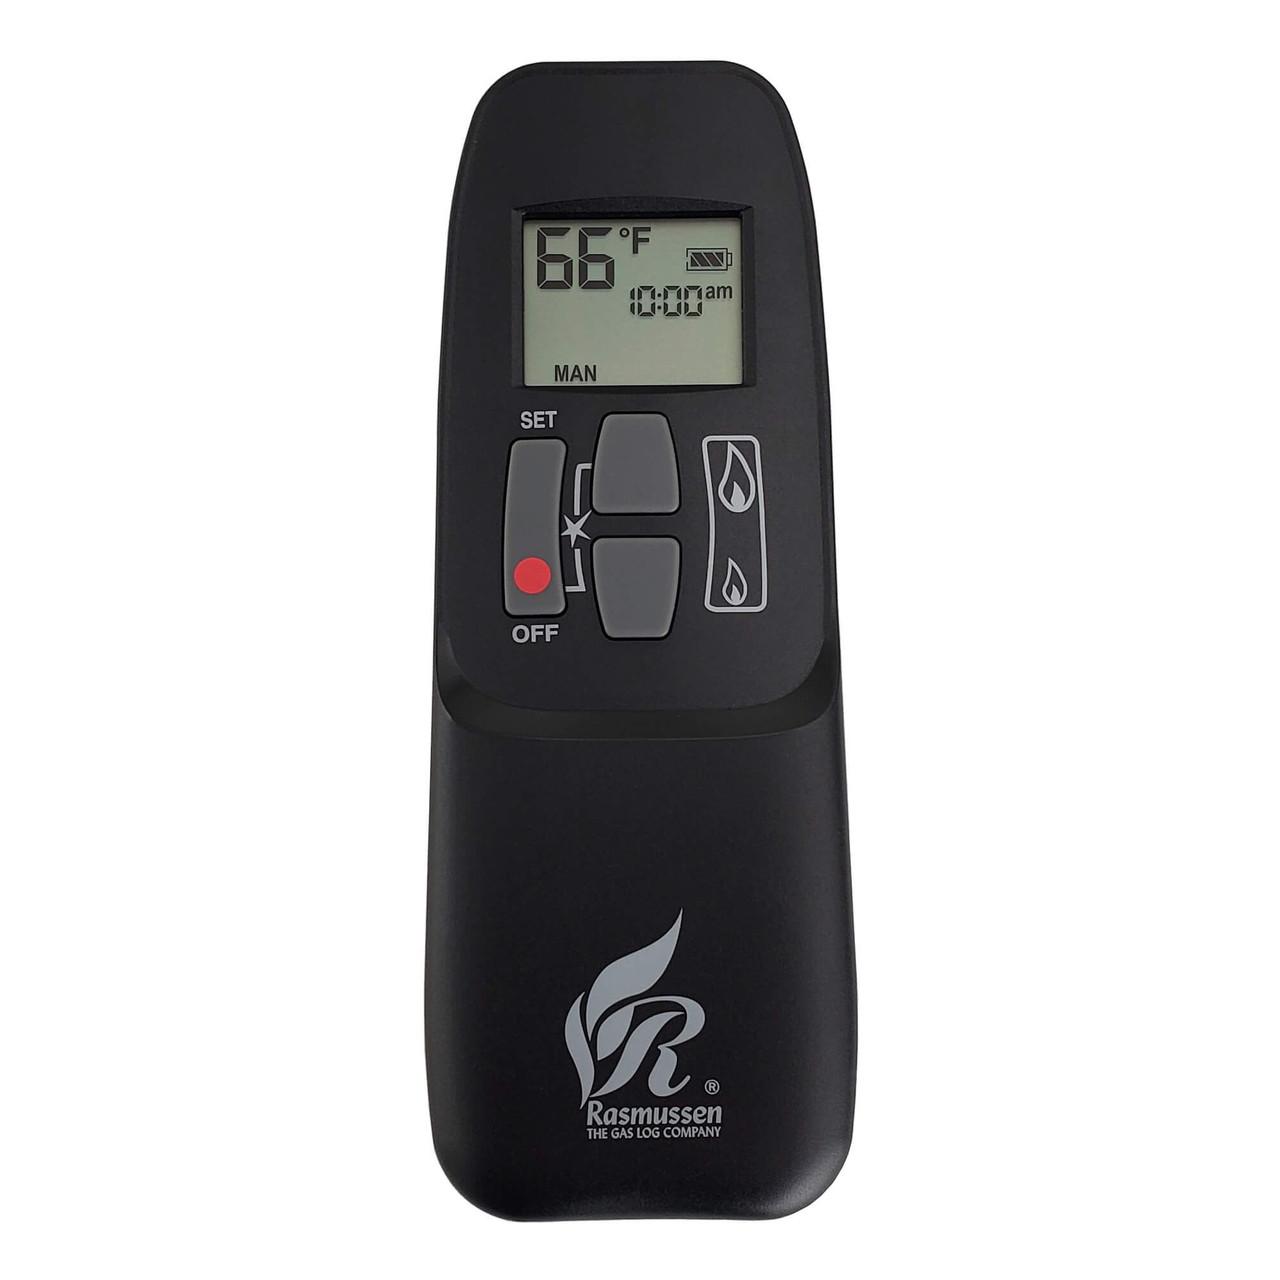 Rasmussen GV60-TXA Vent-Free VEI Remote